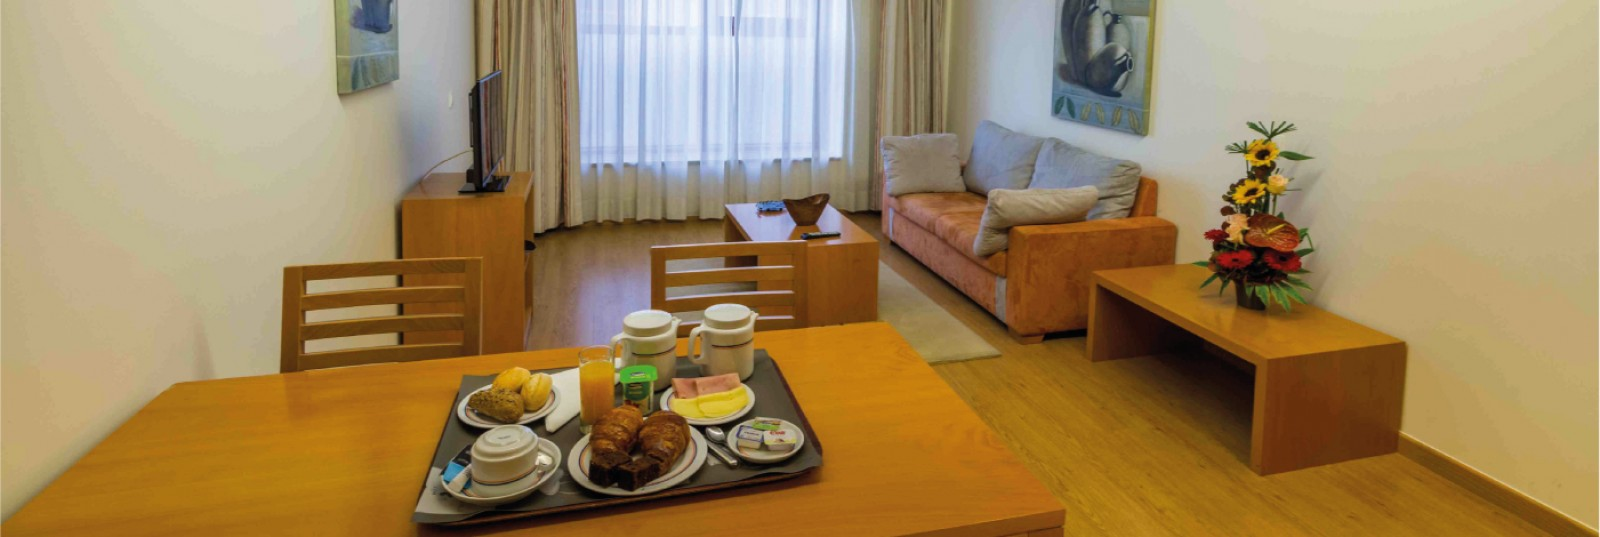 Eurosol Residence Hotel Apartamento - Sala T1